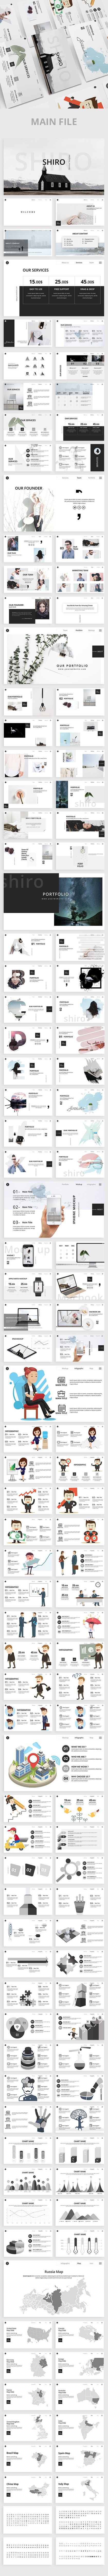 GraphicRiver Shiro Minimal Google Slide Template 20757178